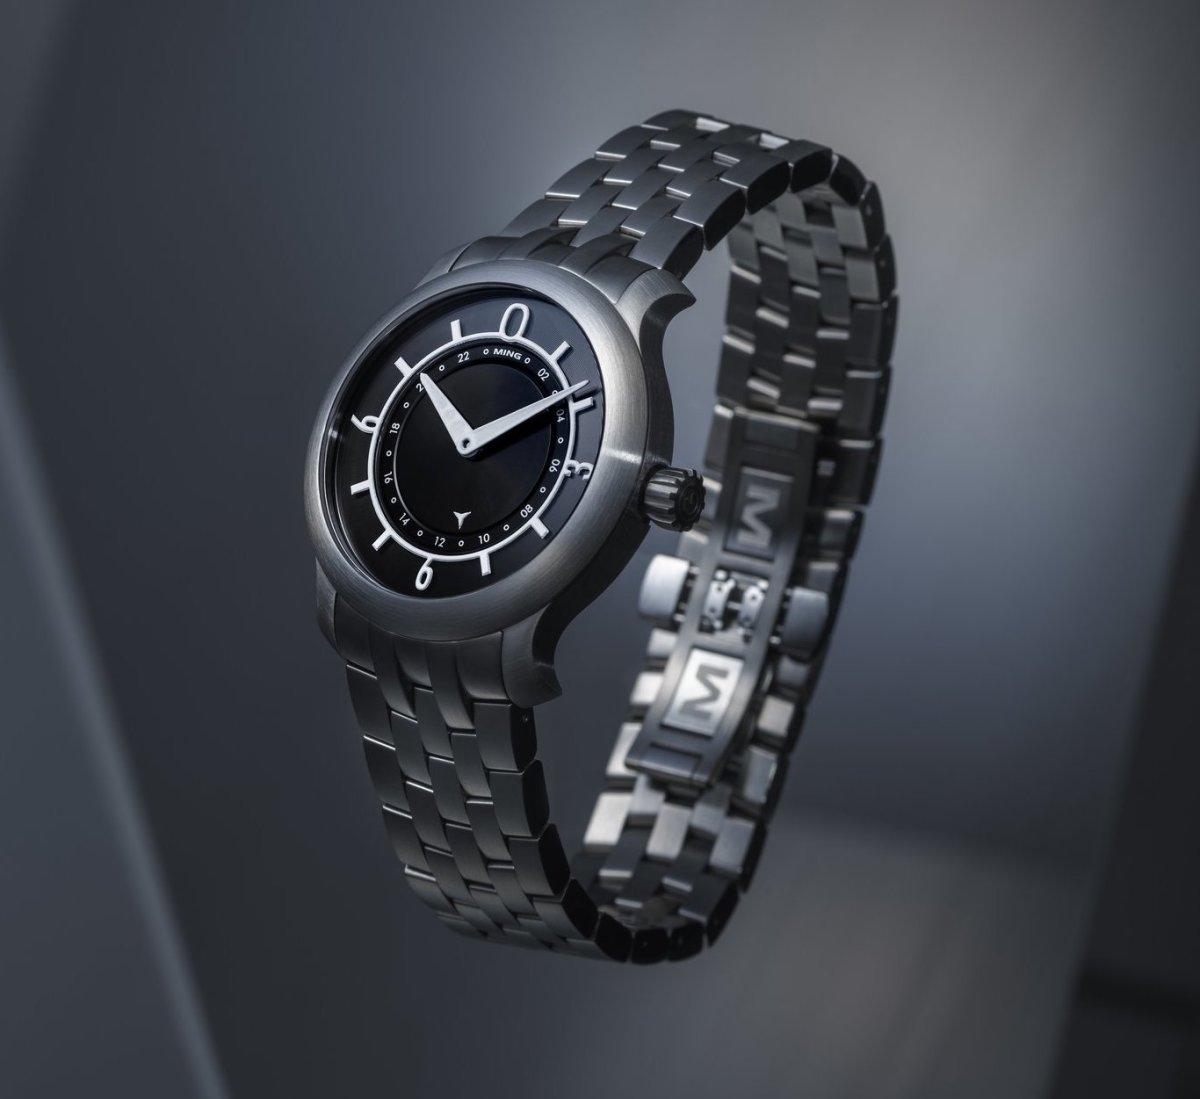 MING GMT